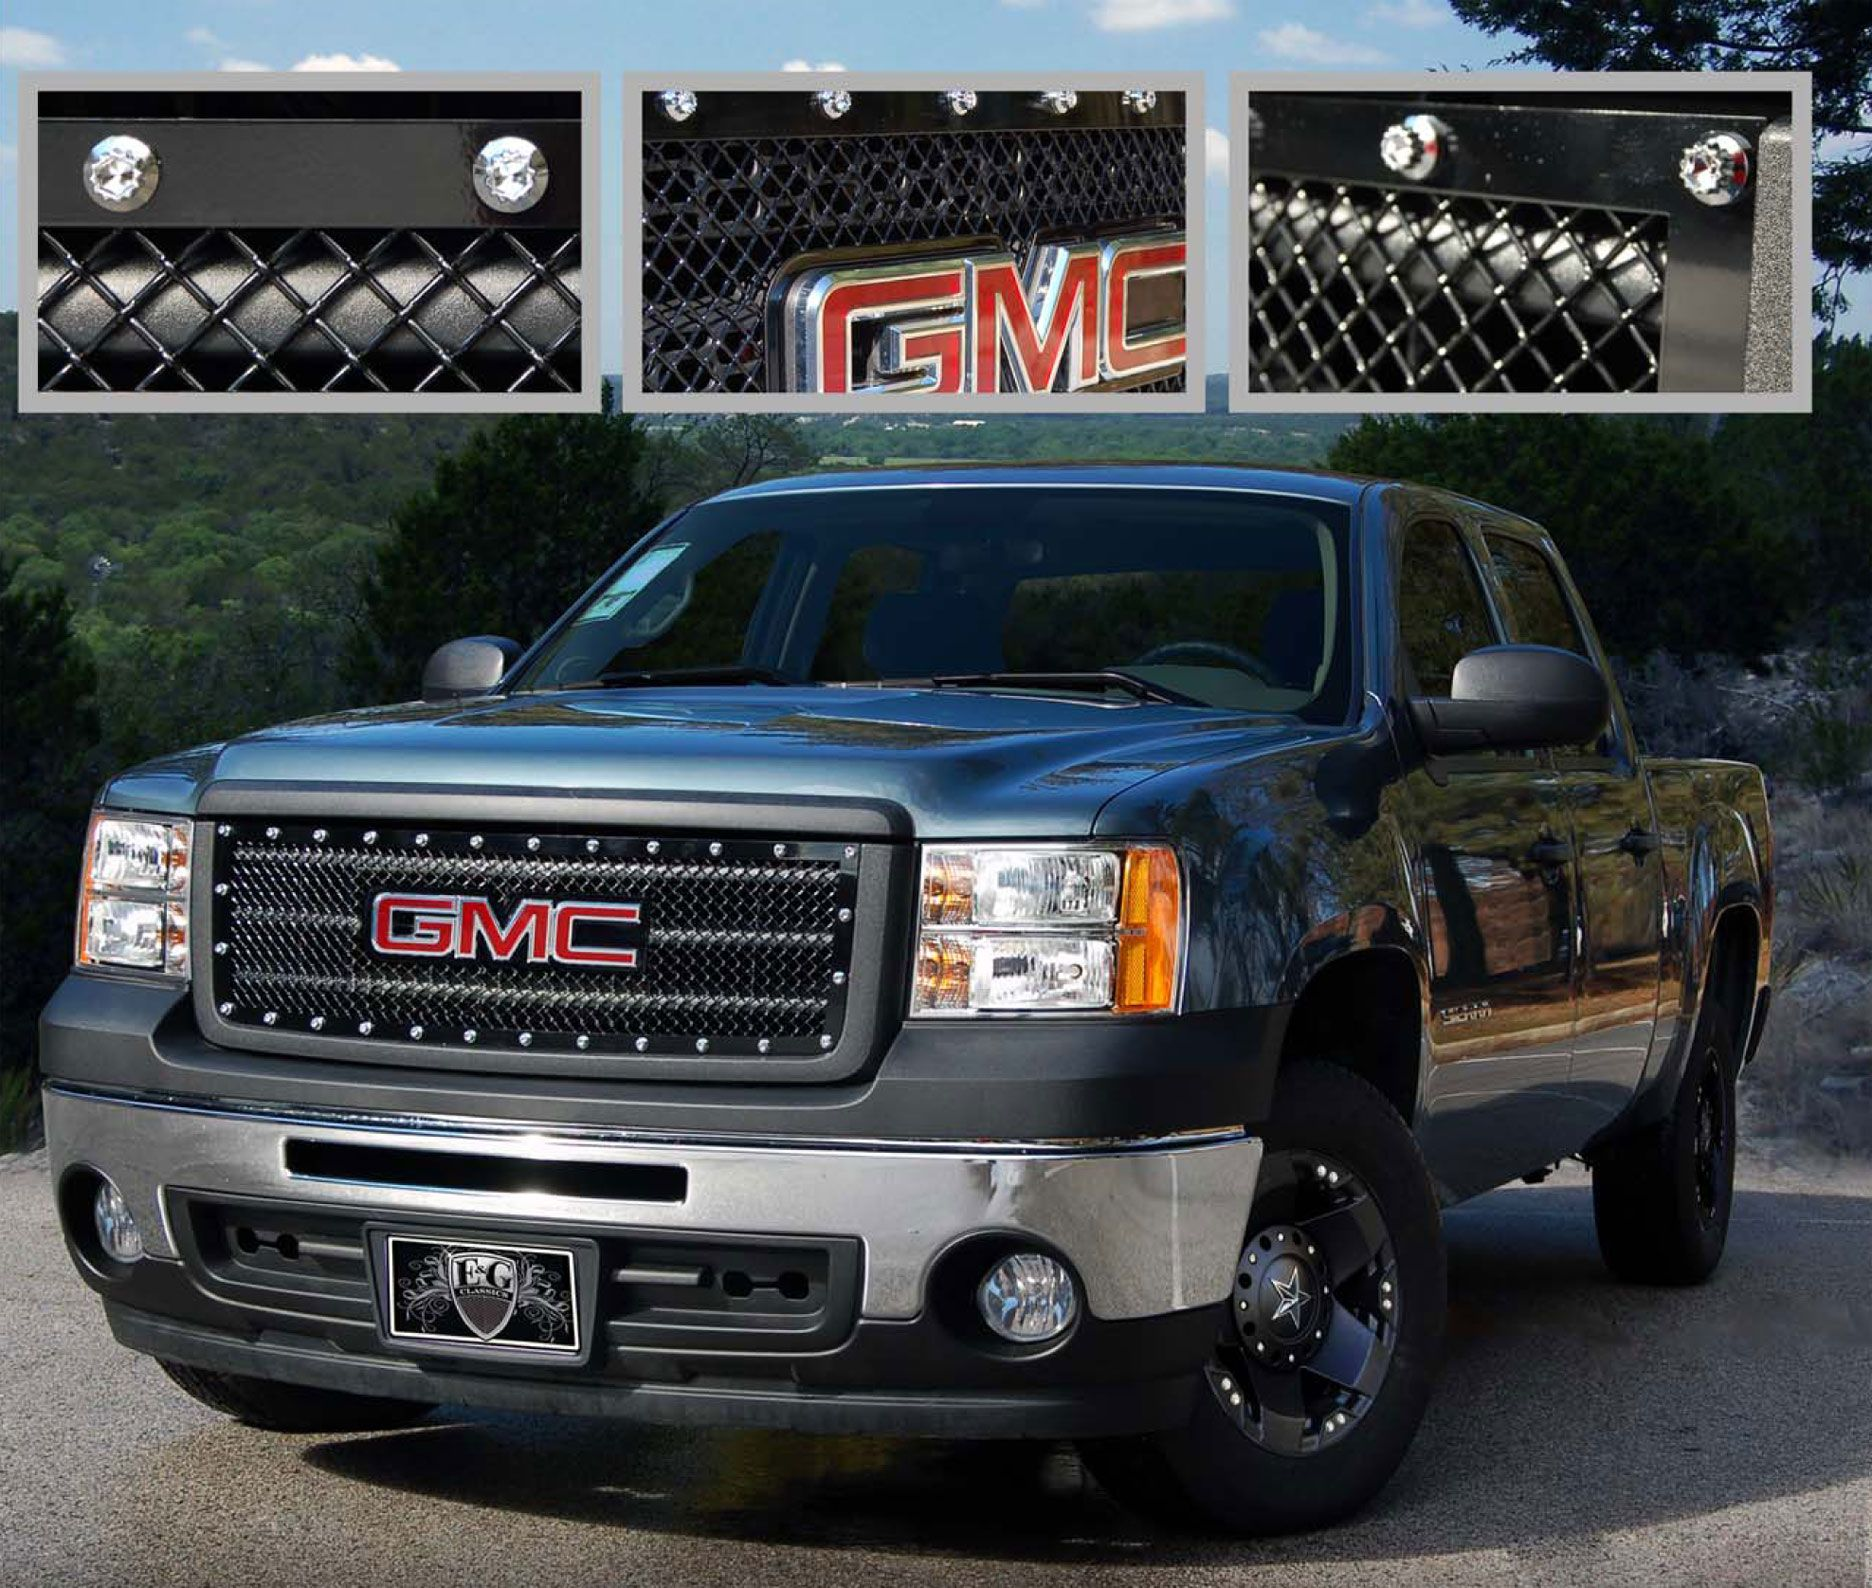 accessories gmc sierra silverado chevrolet pictures and of truck interior